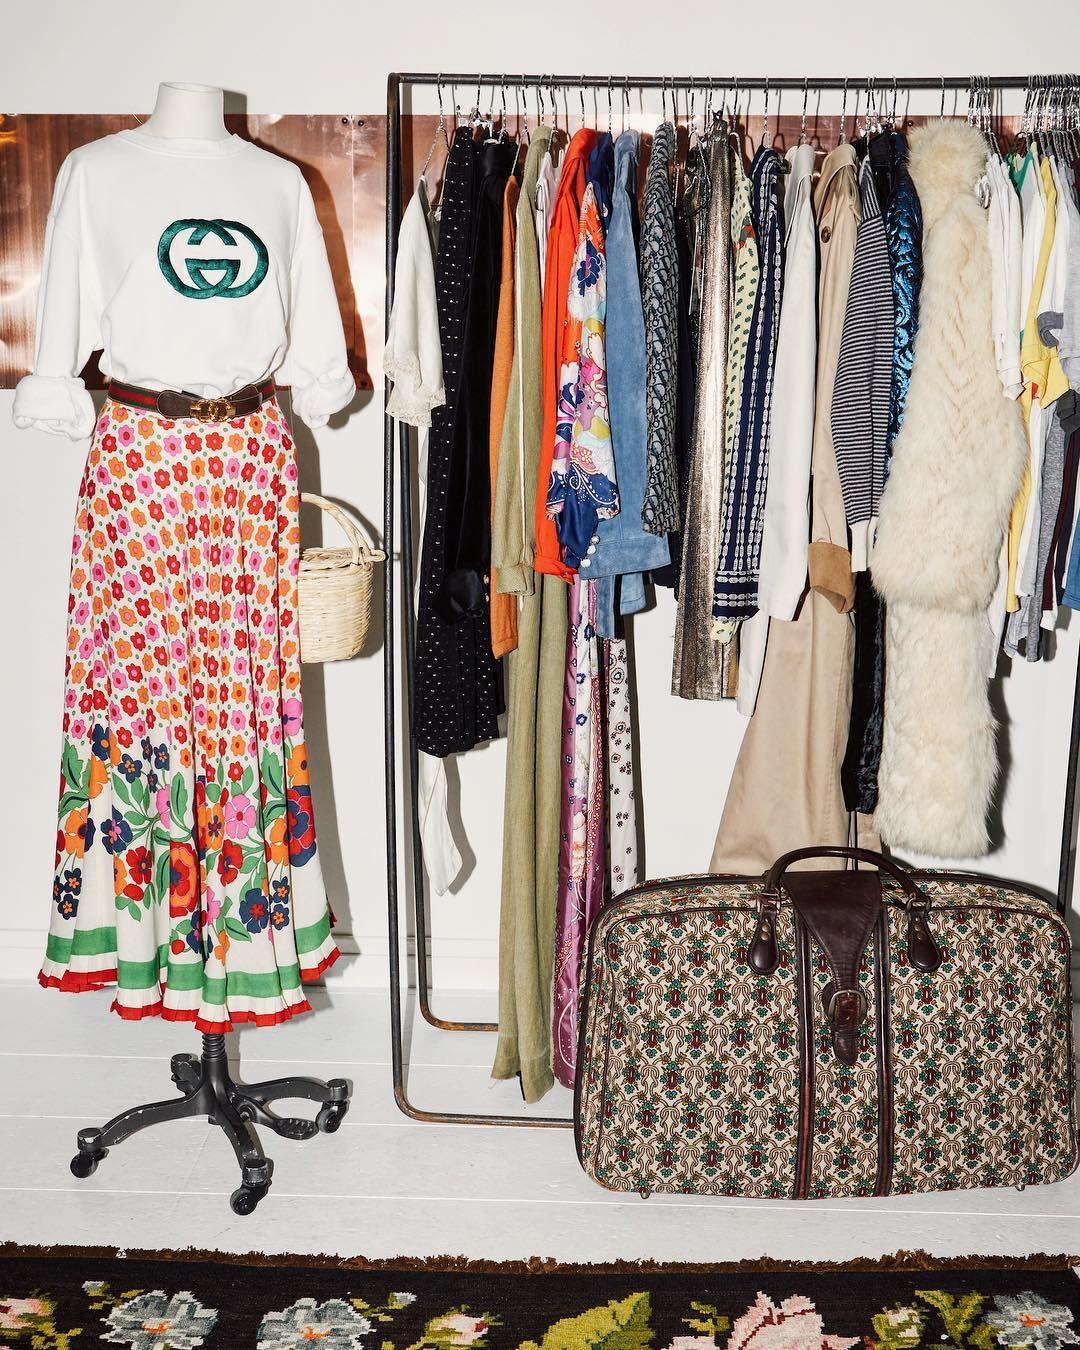 Shop The 23 Best Online Vintage Clothing Stores Whowhatwear Vintage Clothing Stores Vintage Clothes Shop Online Shopping Clothes